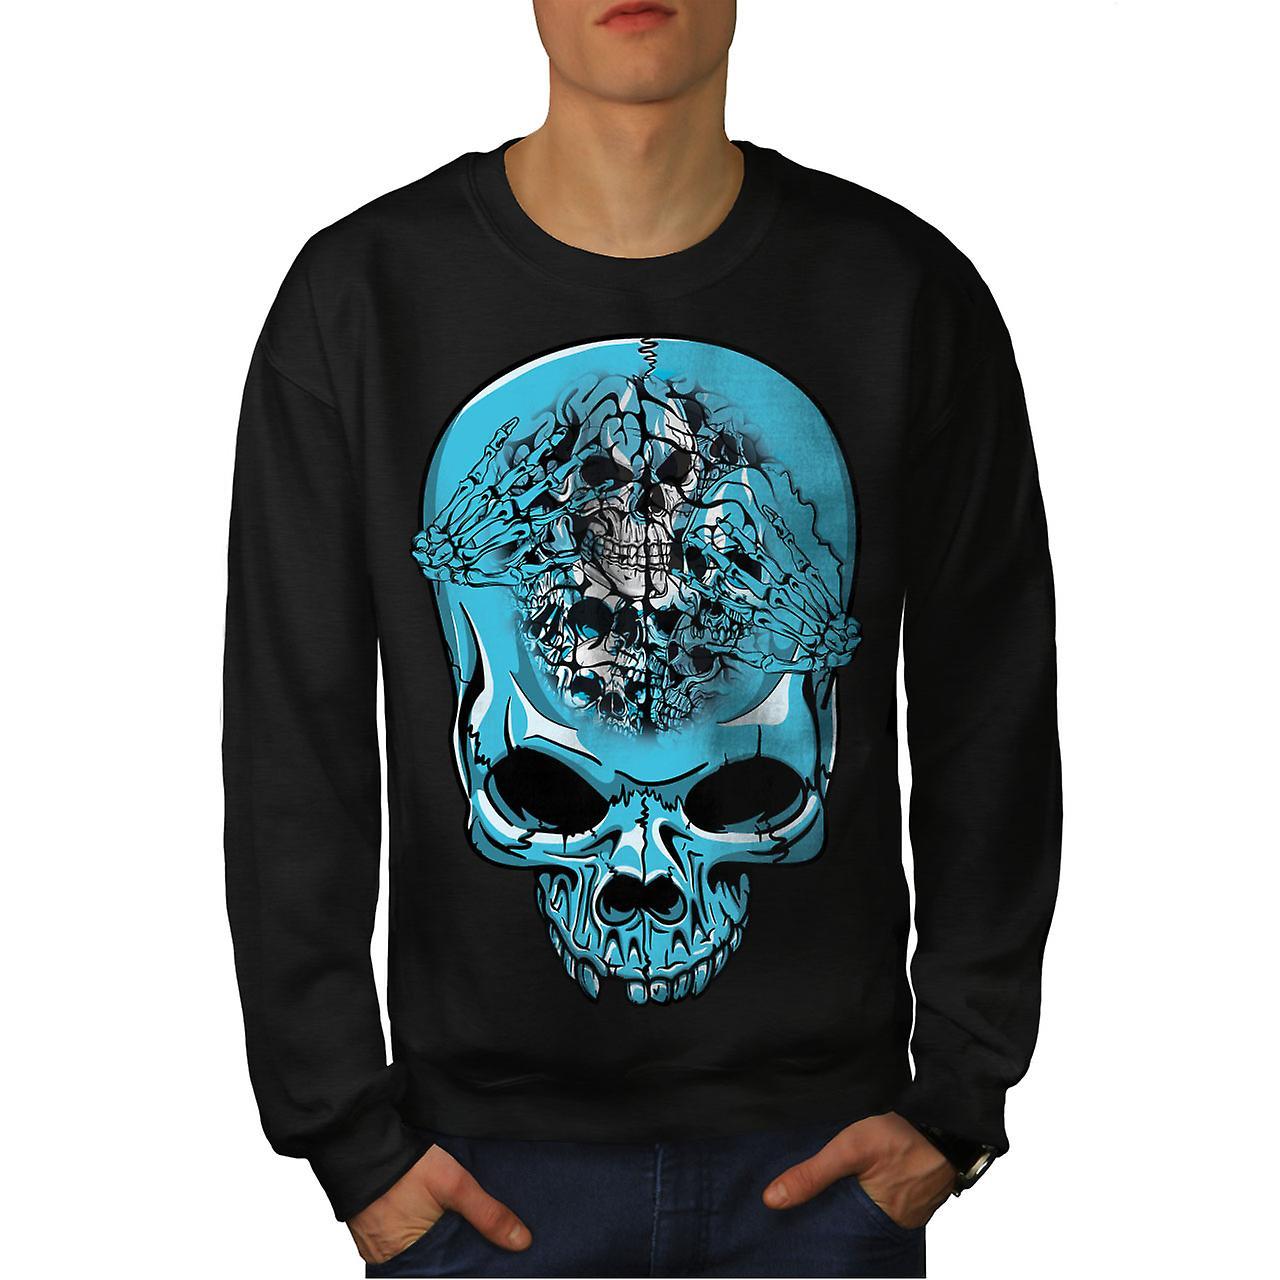 Squelette Cool Angry Men noirSweatshirt